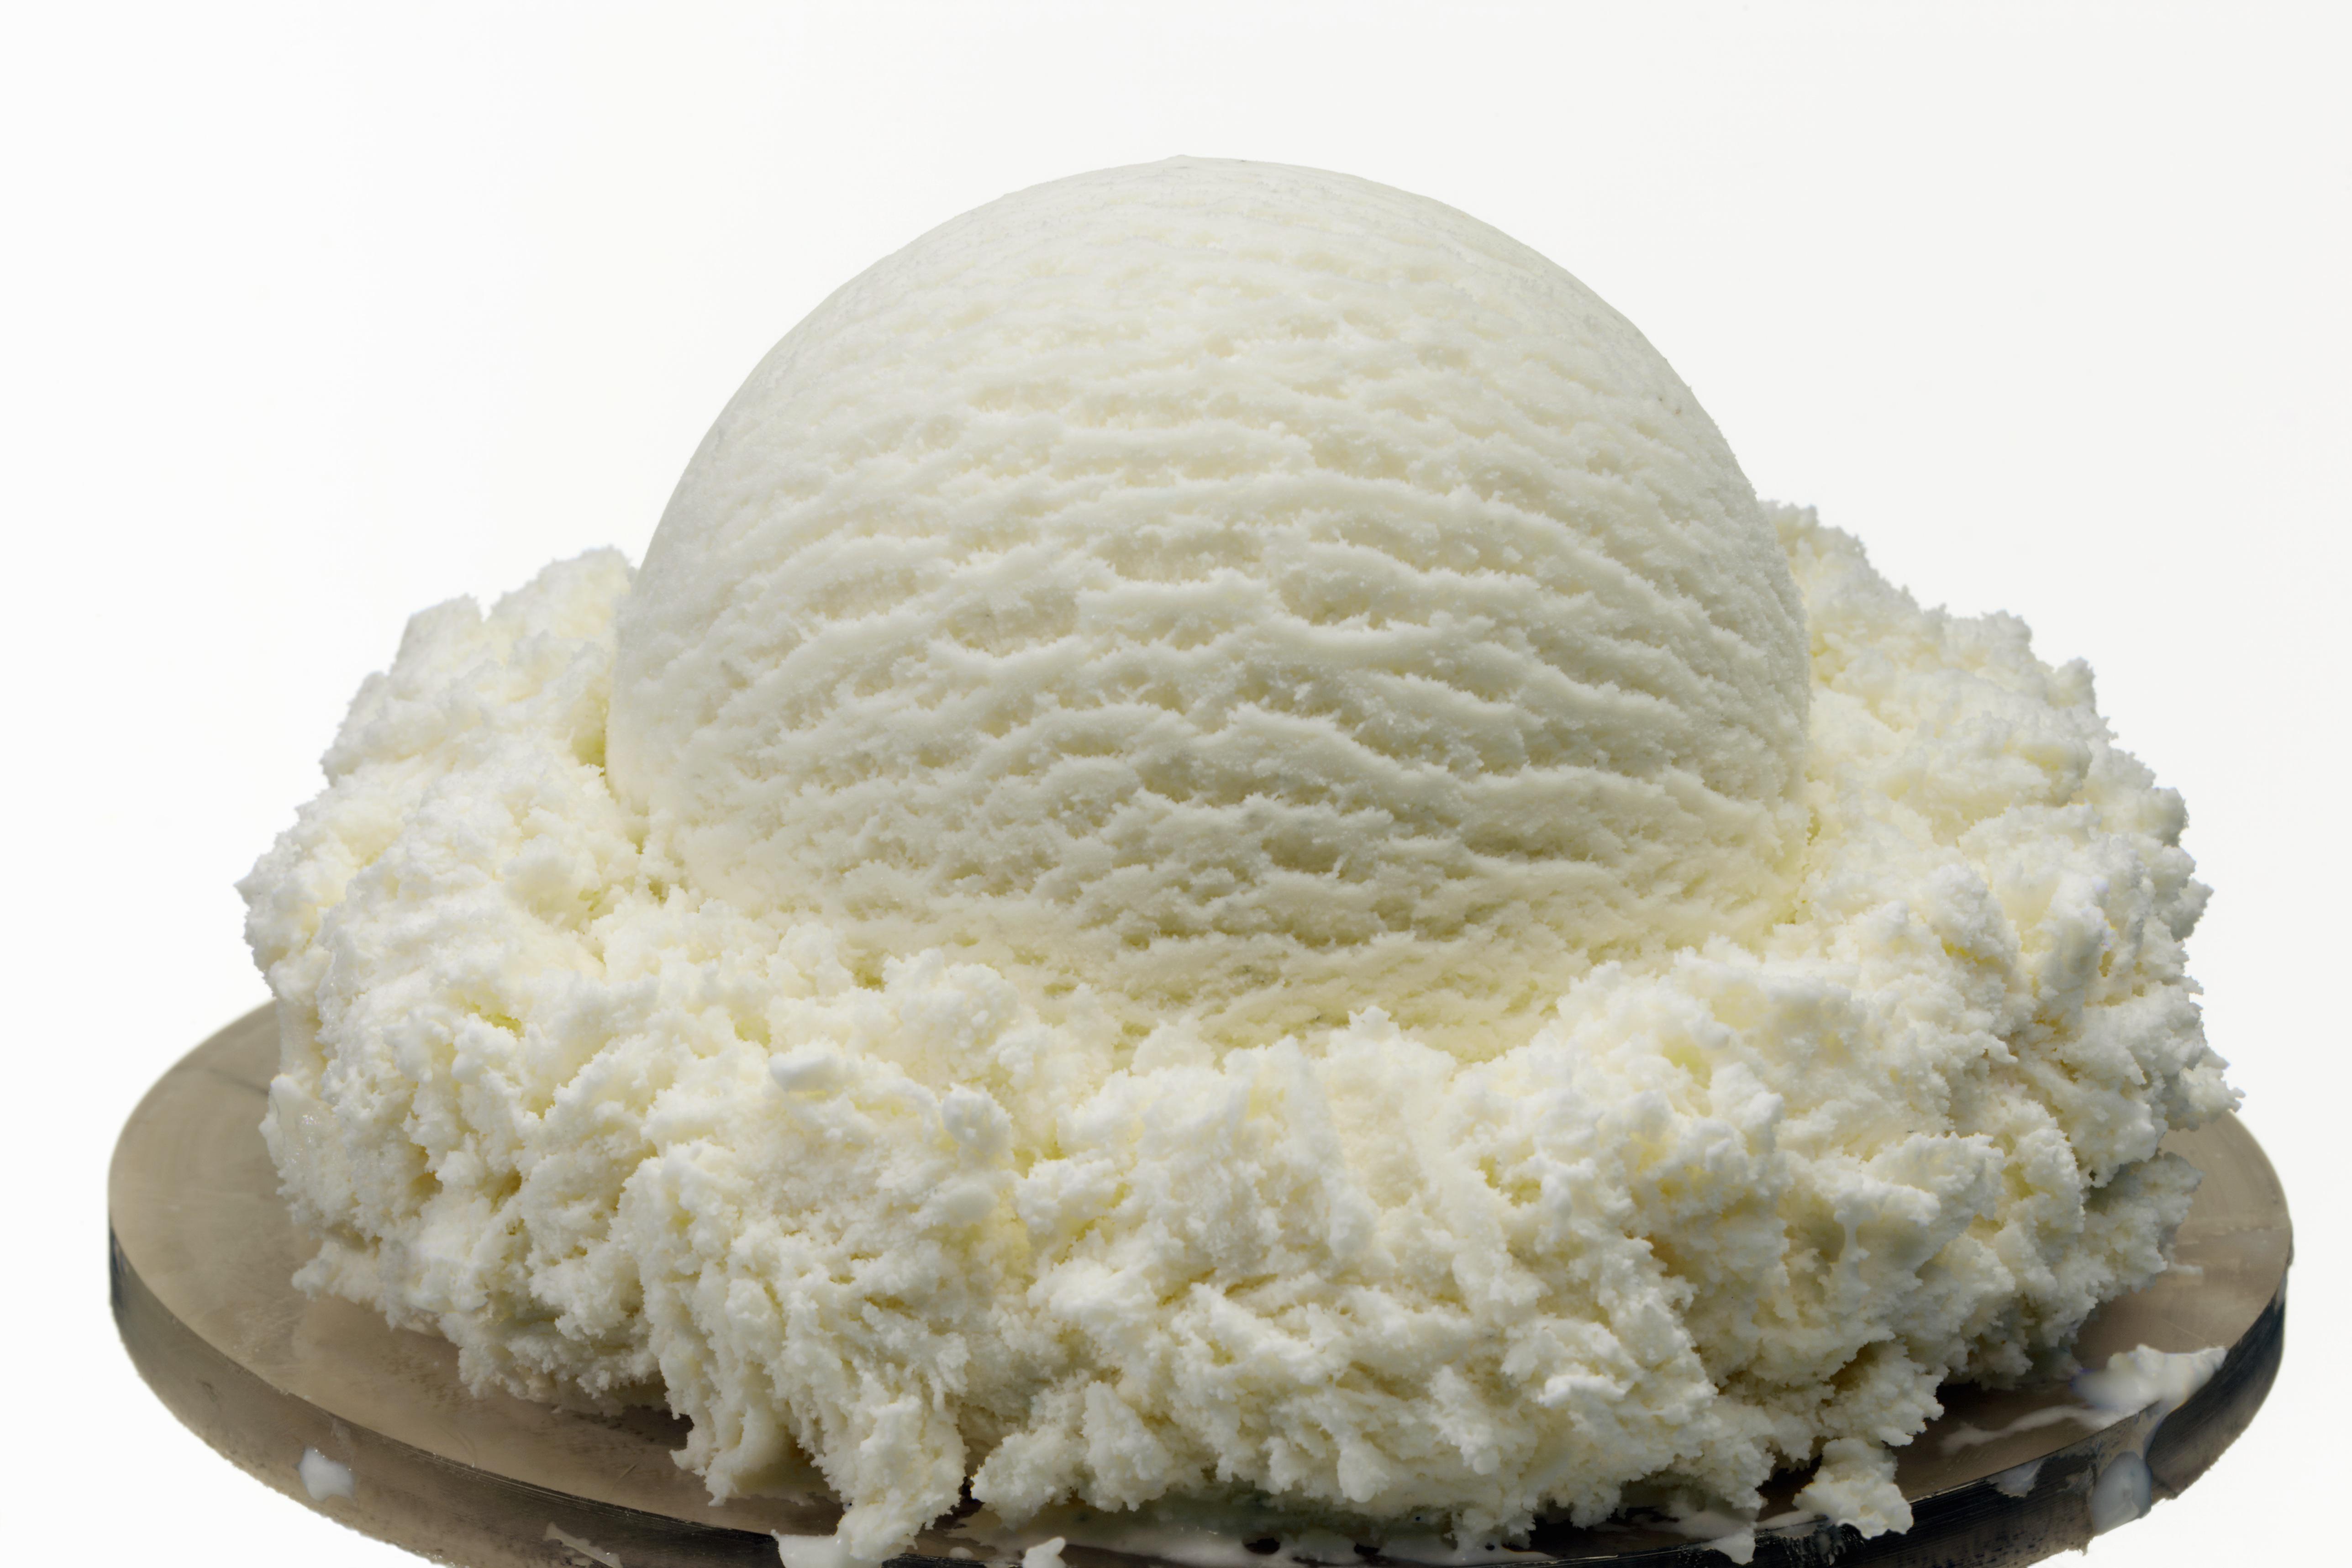 A Scoop of Vanilla Ice Cream